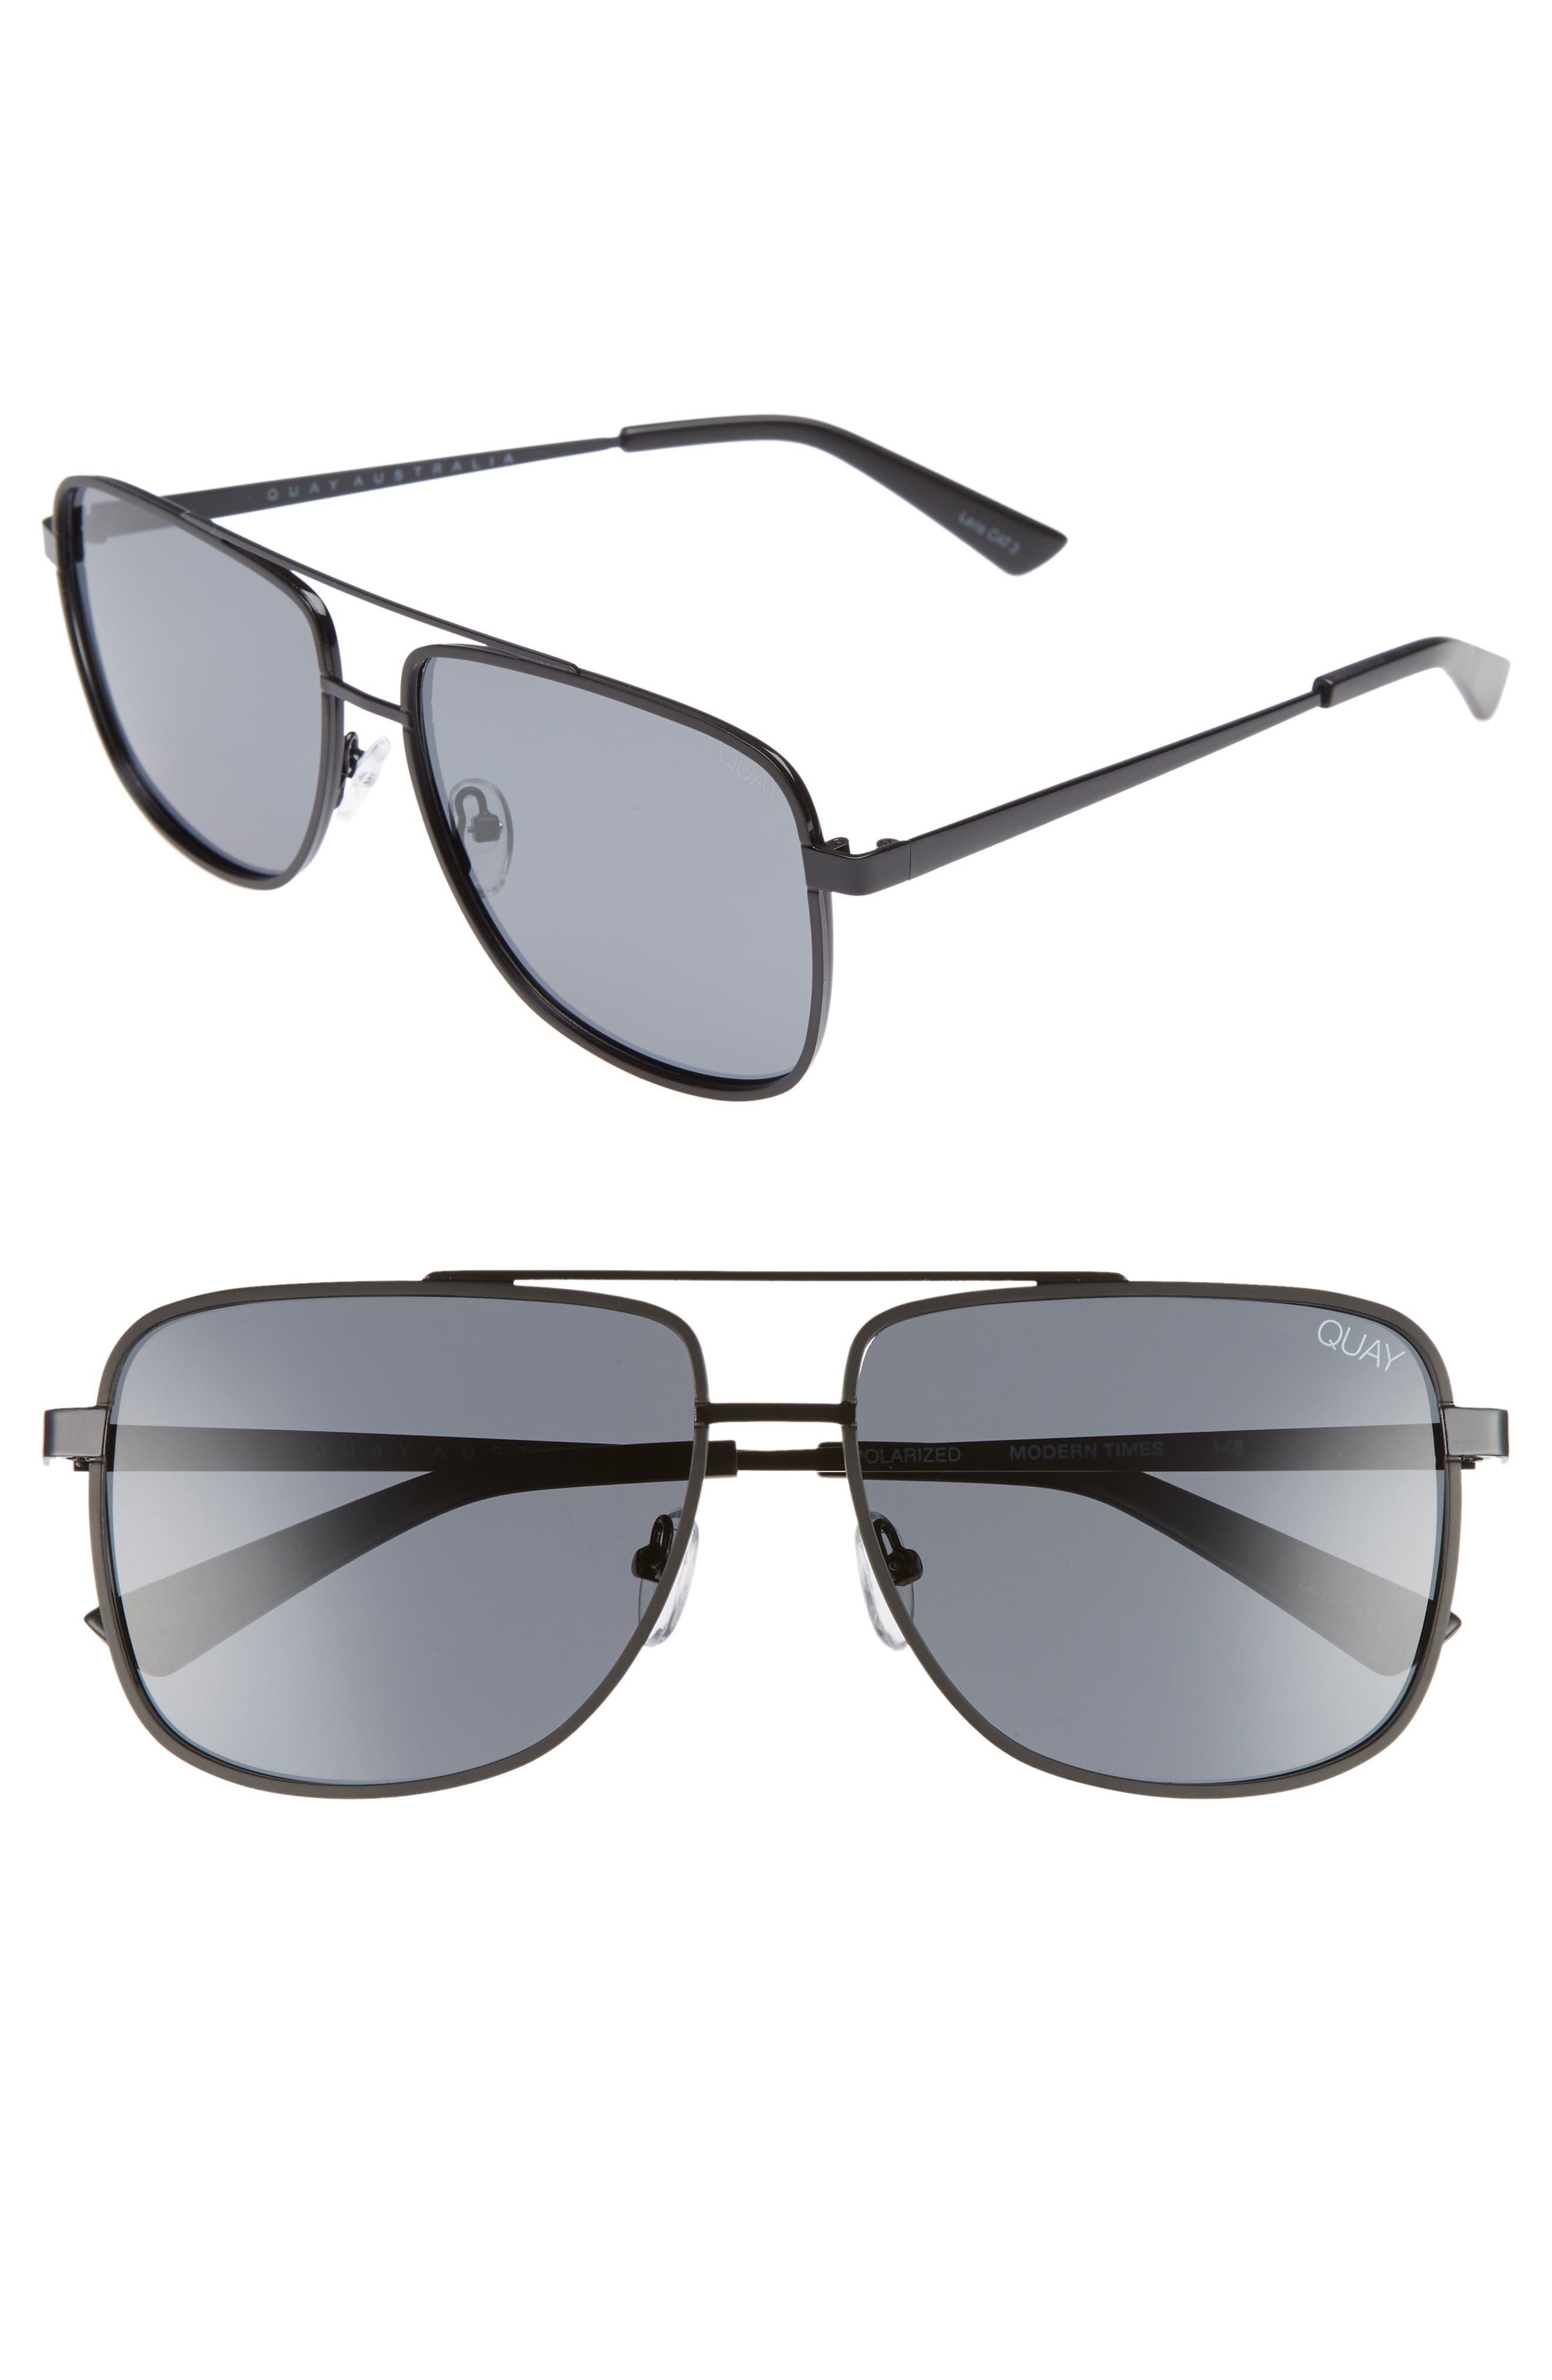 Modern Times 57mm Polarized Aviator Sunglasses,                         Main,                         color, Black / Smoke Lens